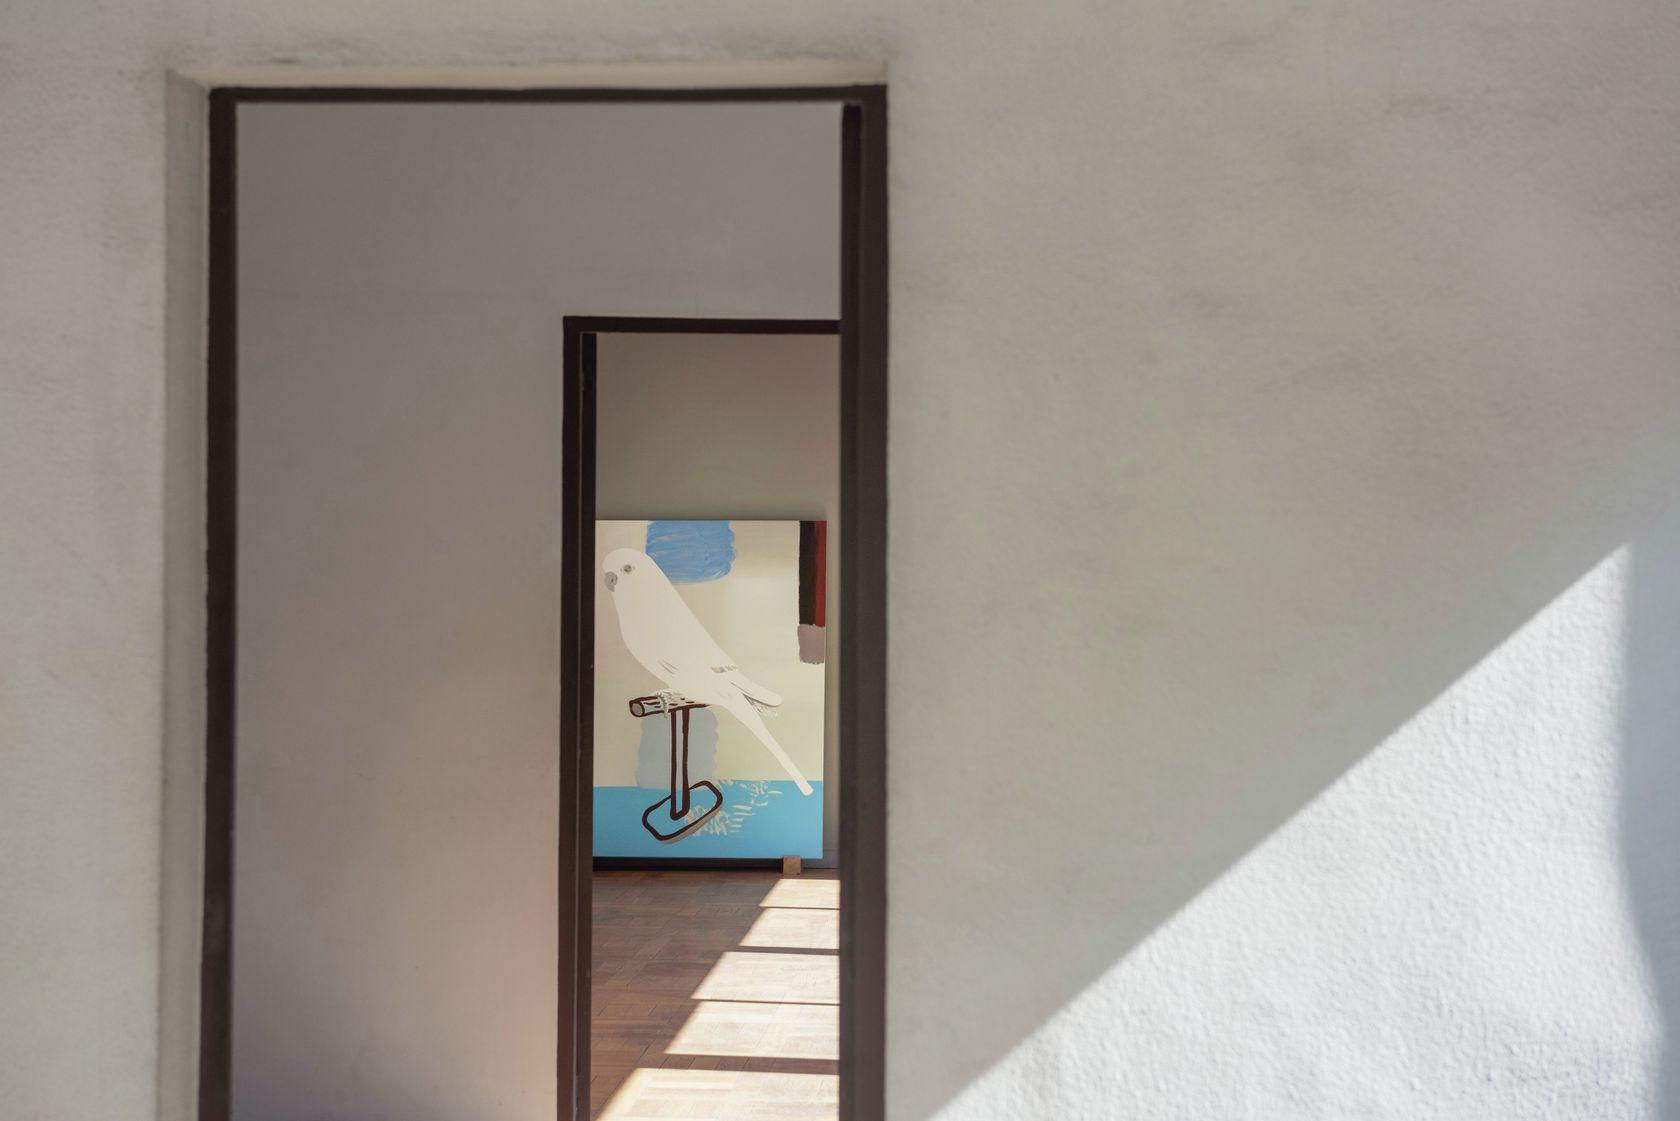 Françoise Pétrovitch, Perruche, 2019 Habiter la Villa, Villa Savoye, Poissy (FR) 18 septembre 2020 - 24 janvier 2021 © Hervé Plumet